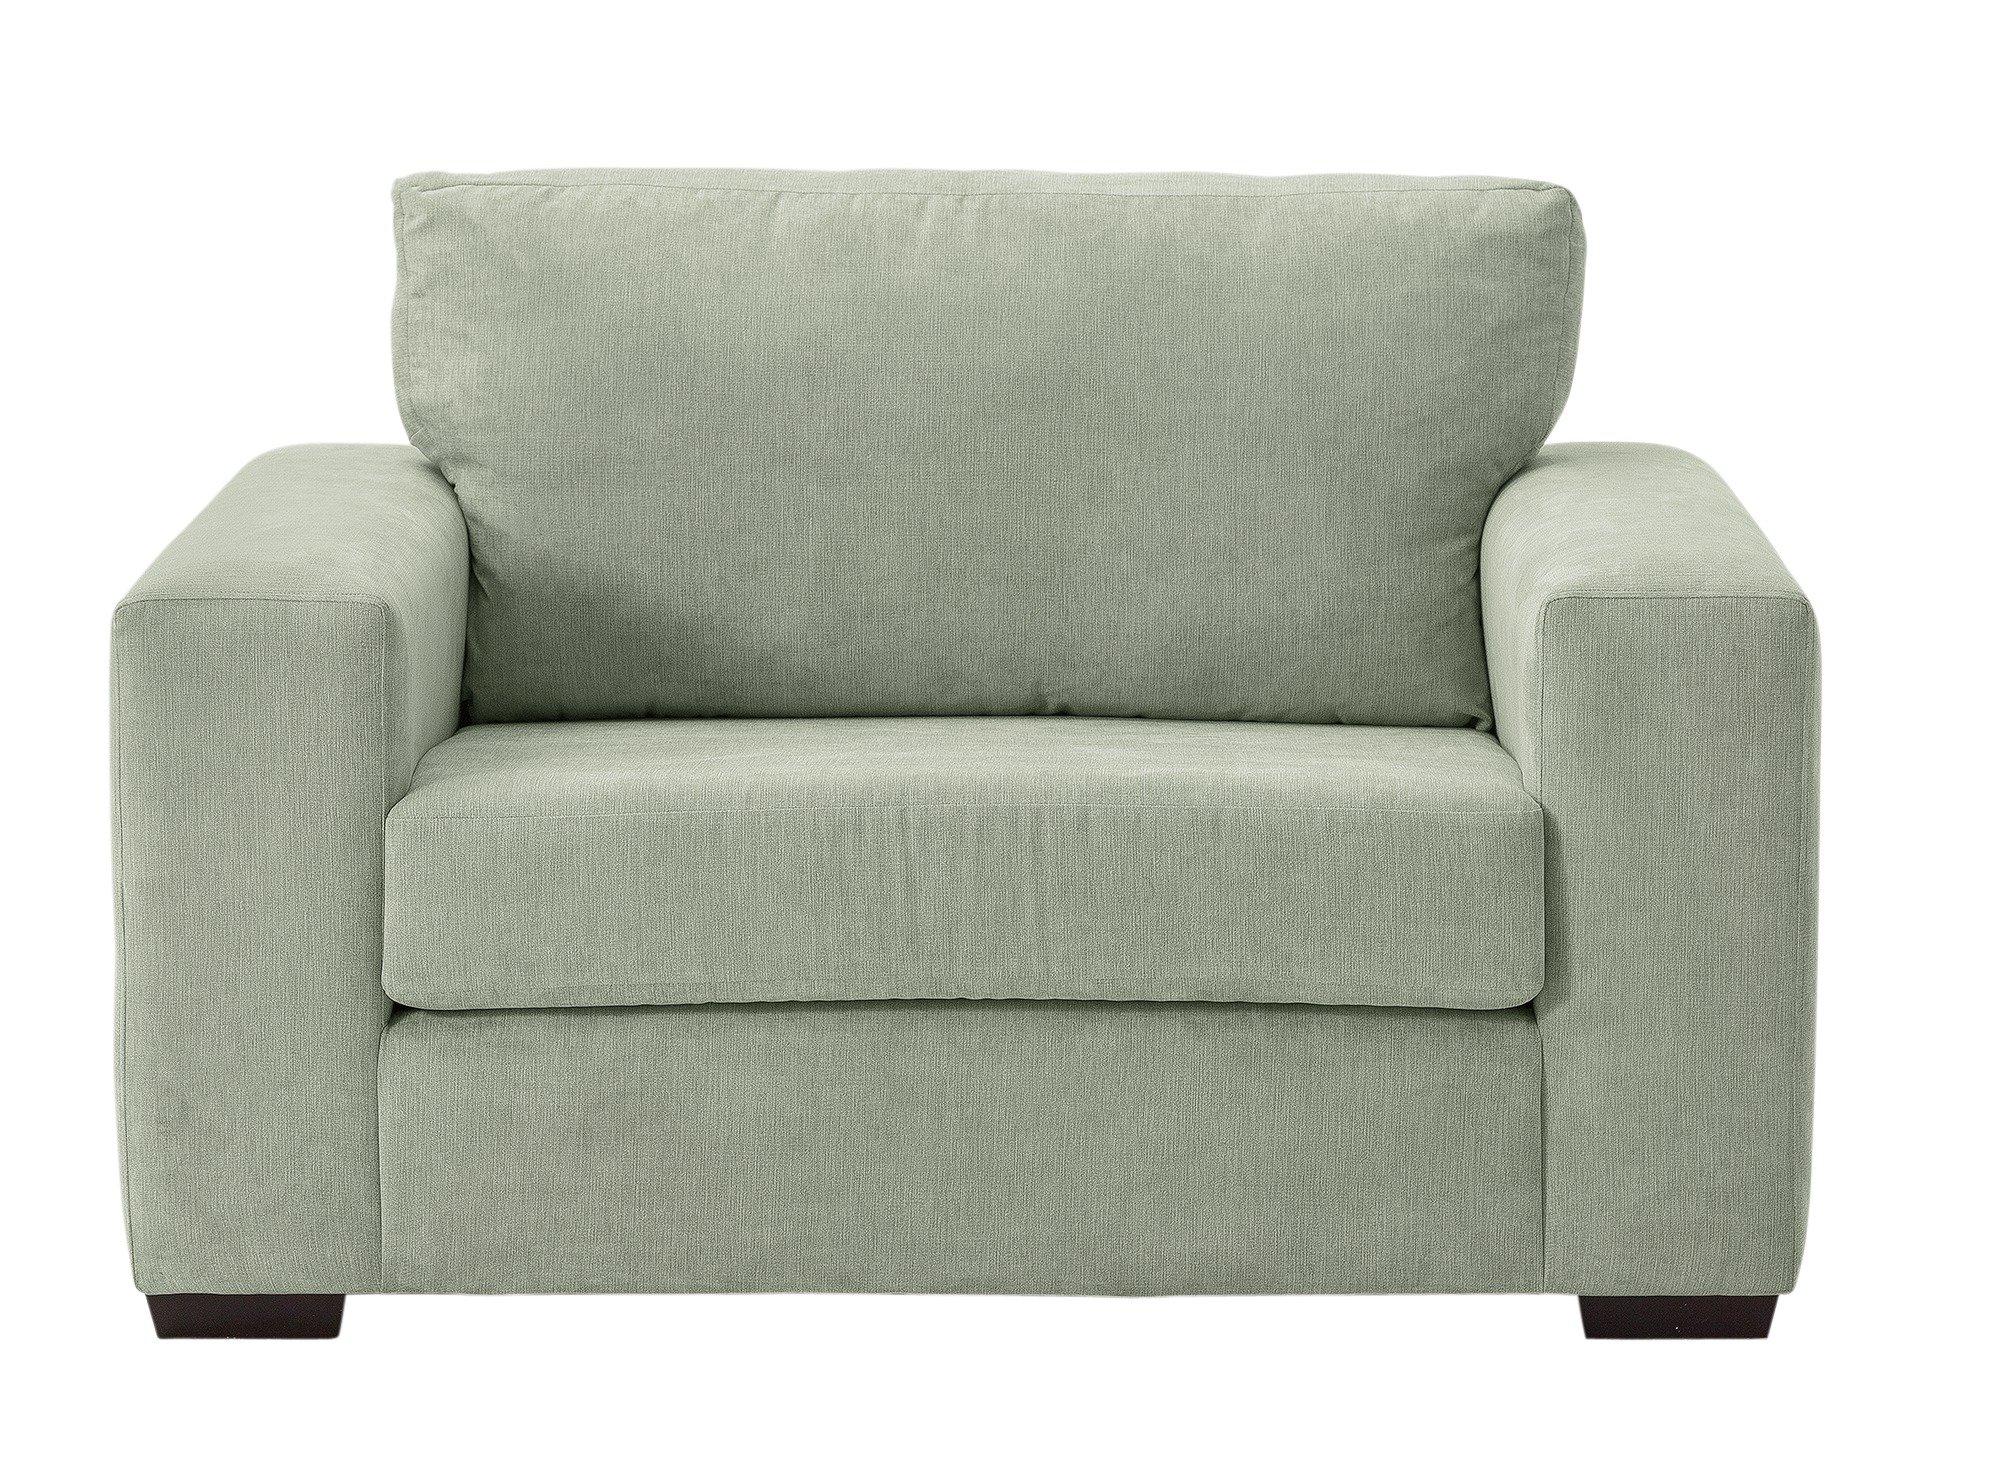 duck egg blue chair argos. Black Bedroom Furniture Sets. Home Design Ideas